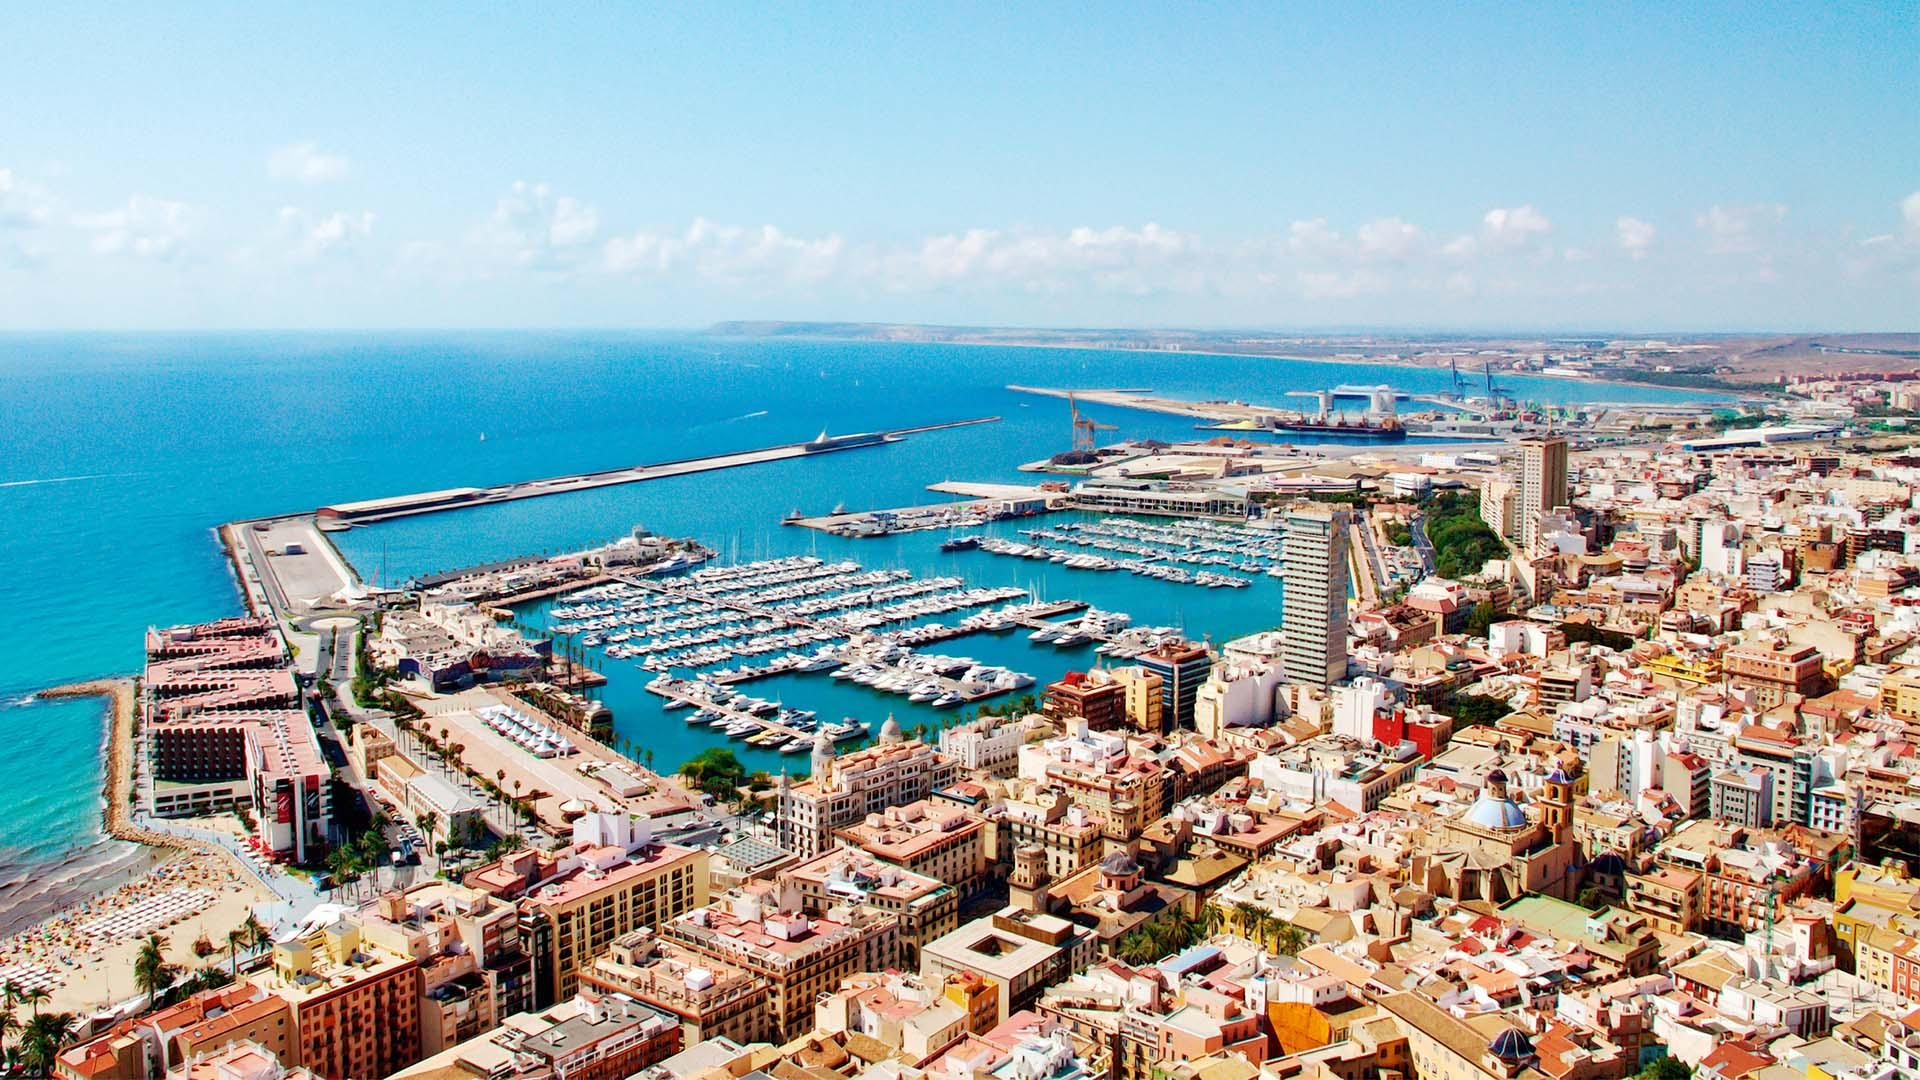 Alicante harbour, Spain